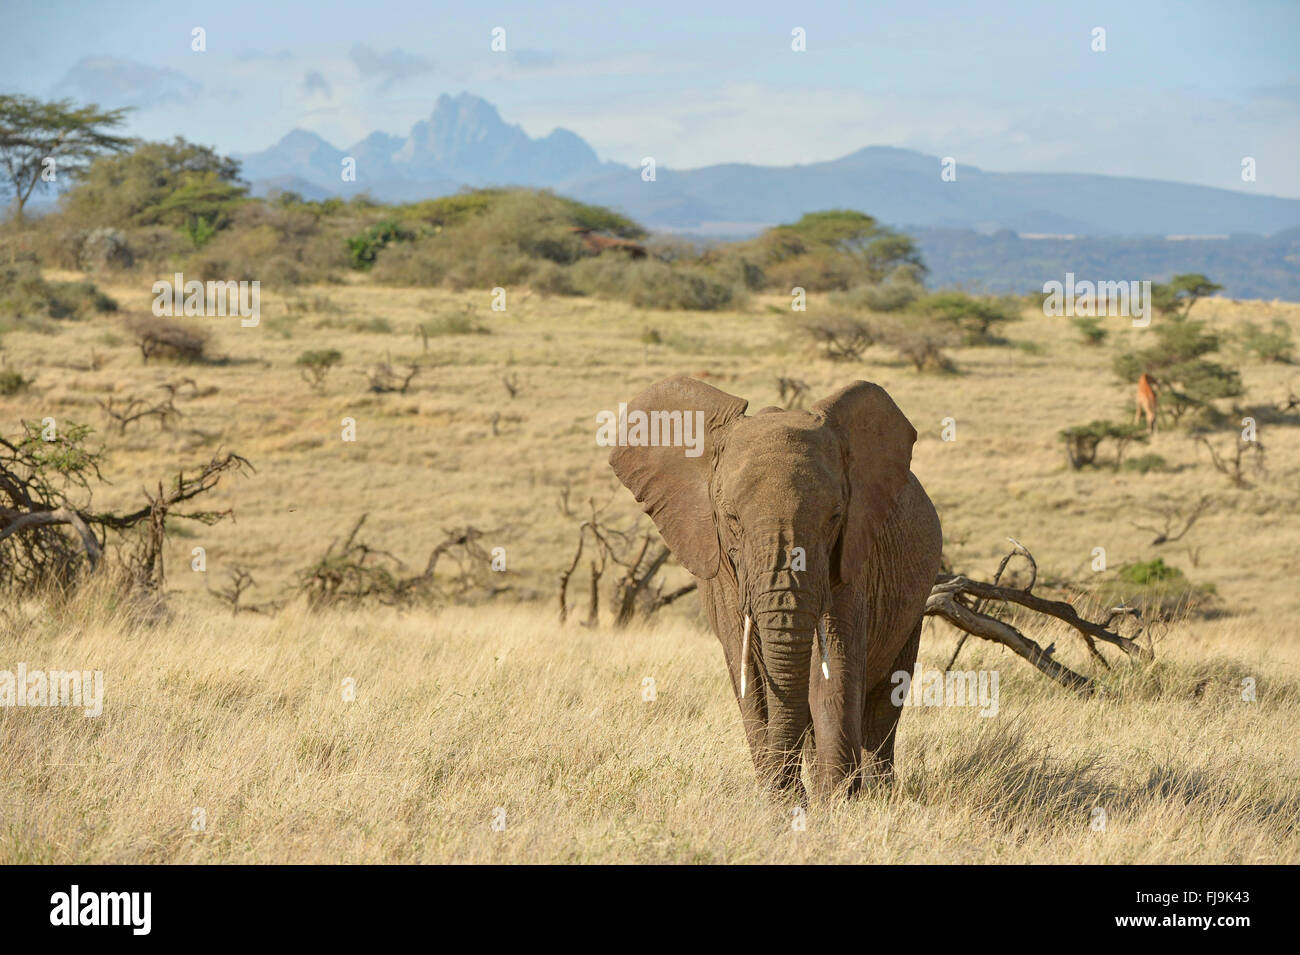 Elefante africano (Loxodonta africana) camminando nell'ambiente, con il monte Kenya in background, Lewa Wildlife Foto Stock